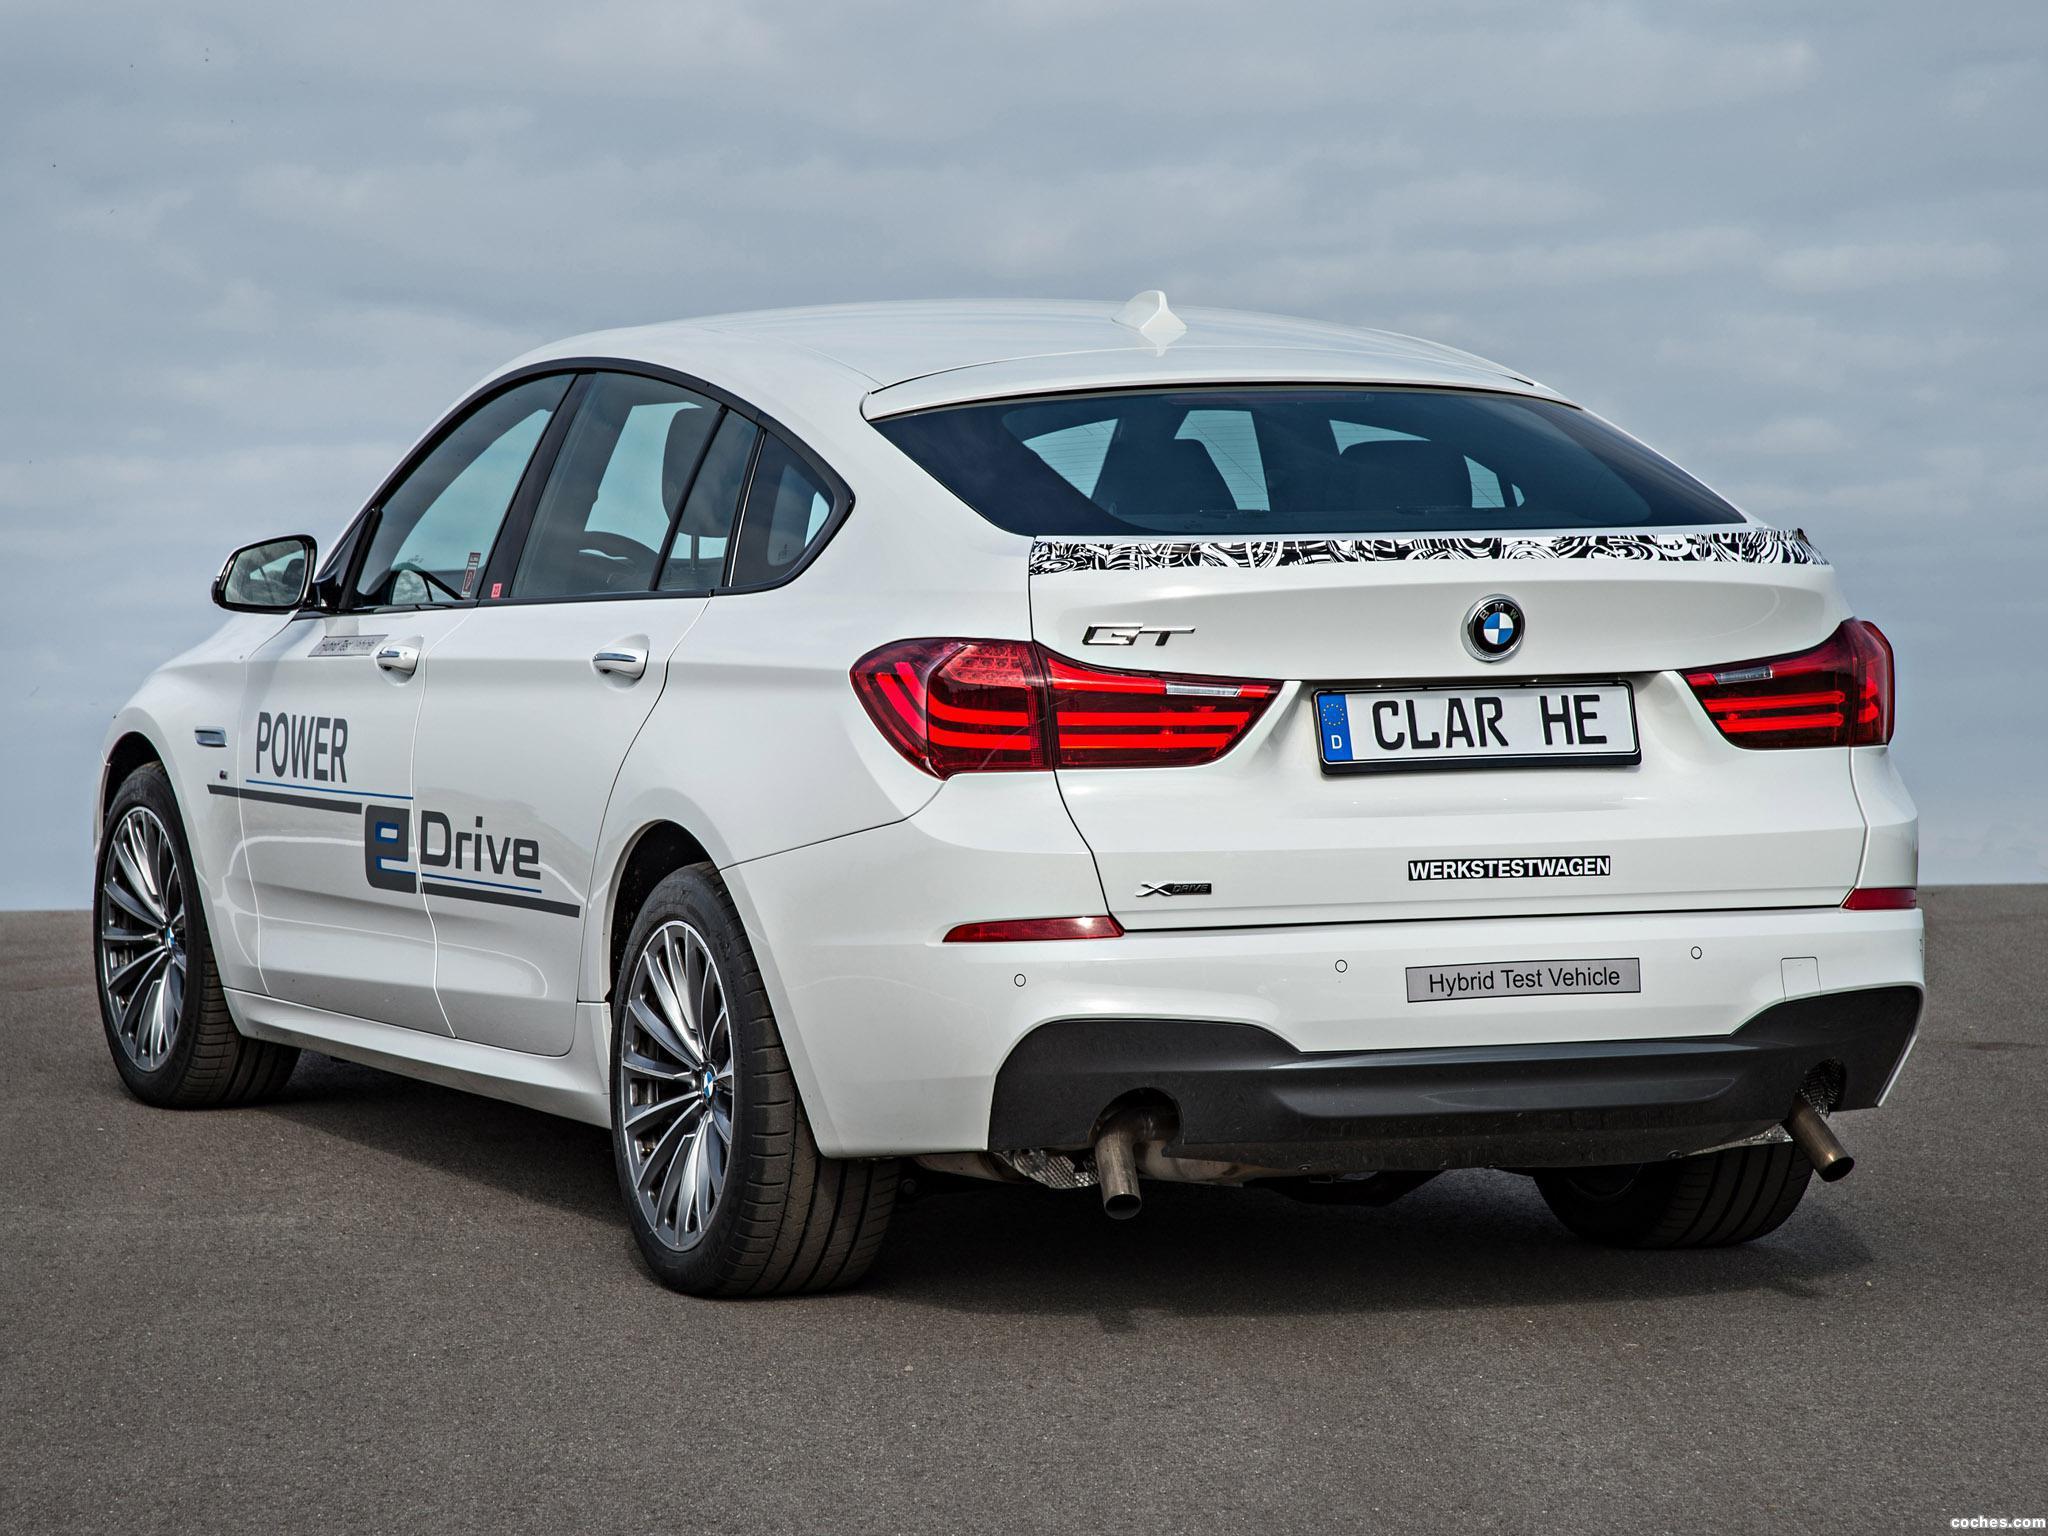 Foto 1 de BMW Serie 5 Gran Turismo Edrive Prototype 2014